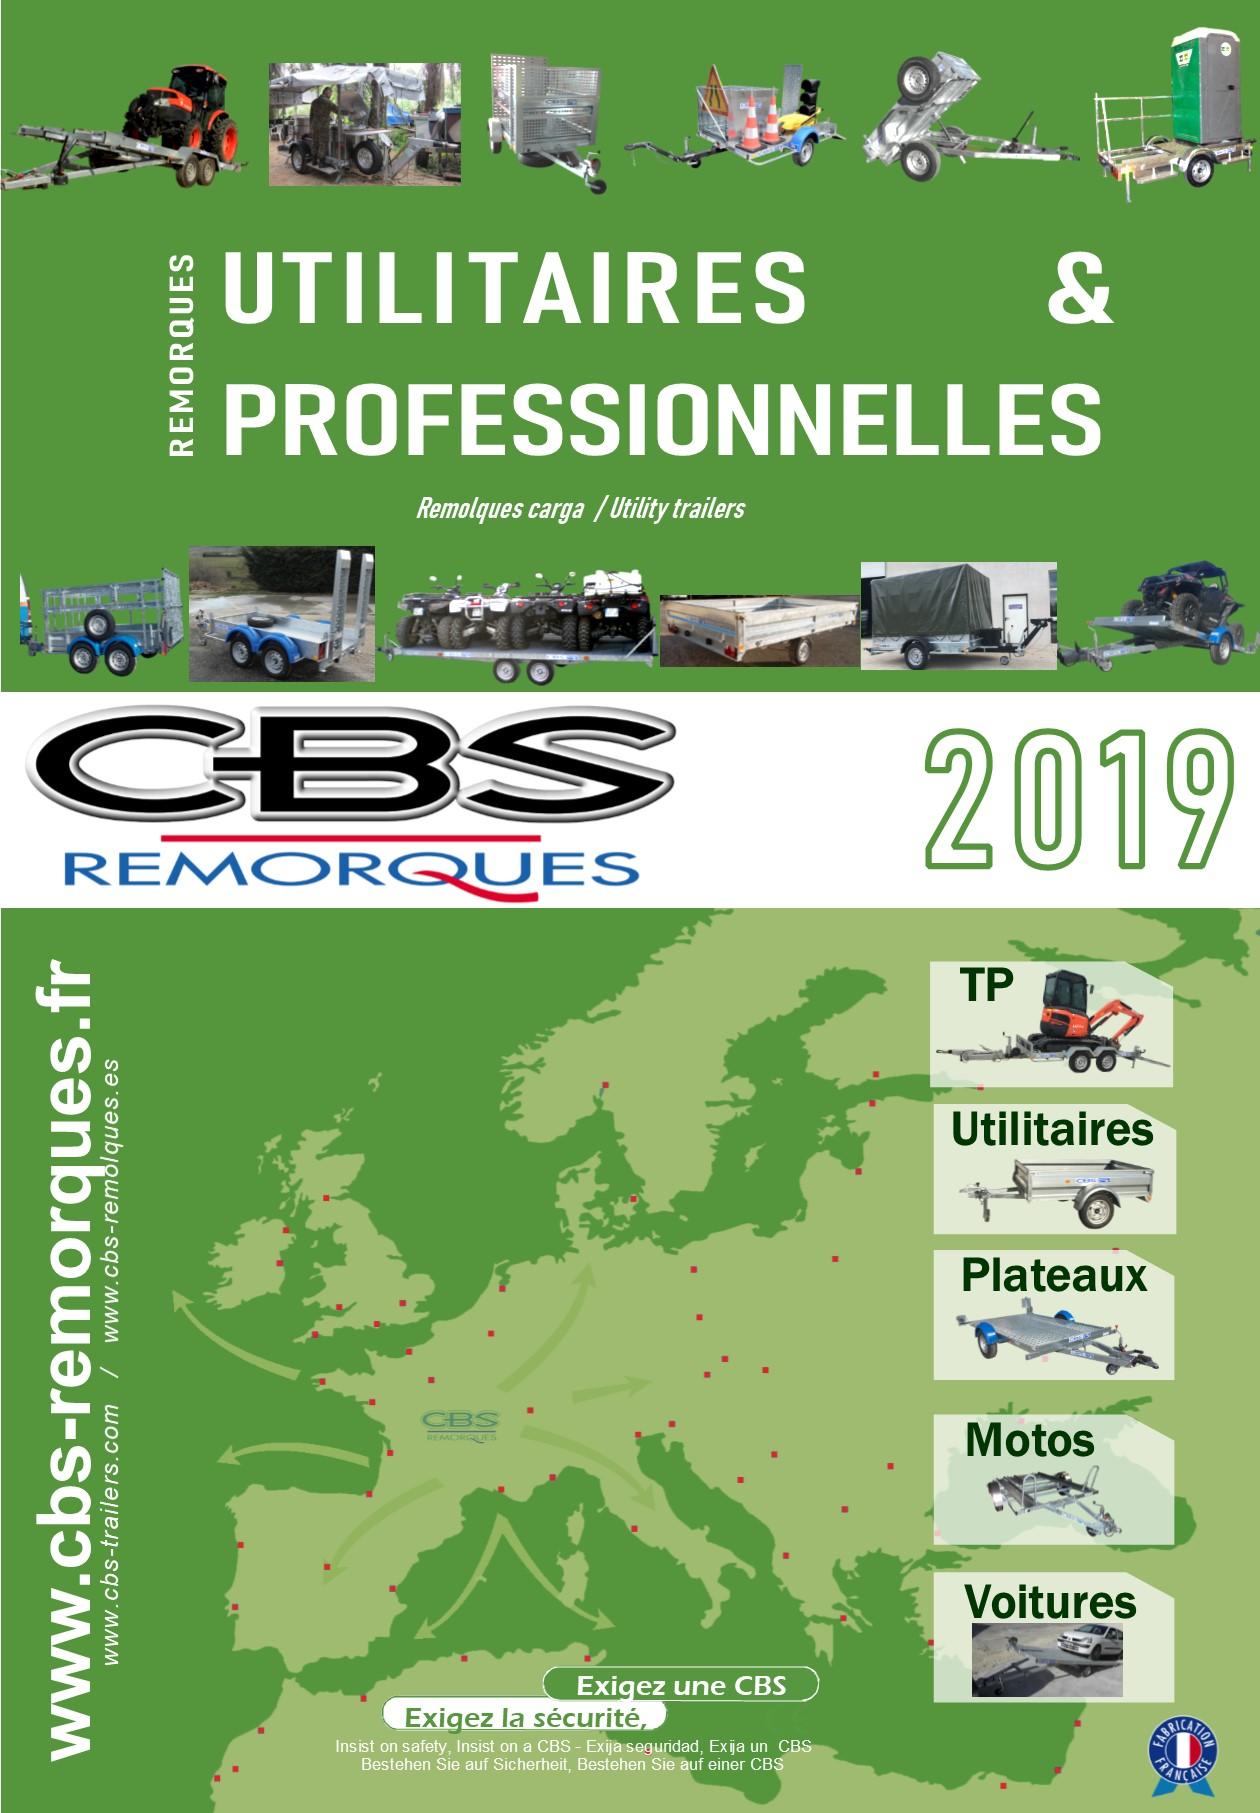 catalogue utilitaires 2019 Cbs Remorques.jpg